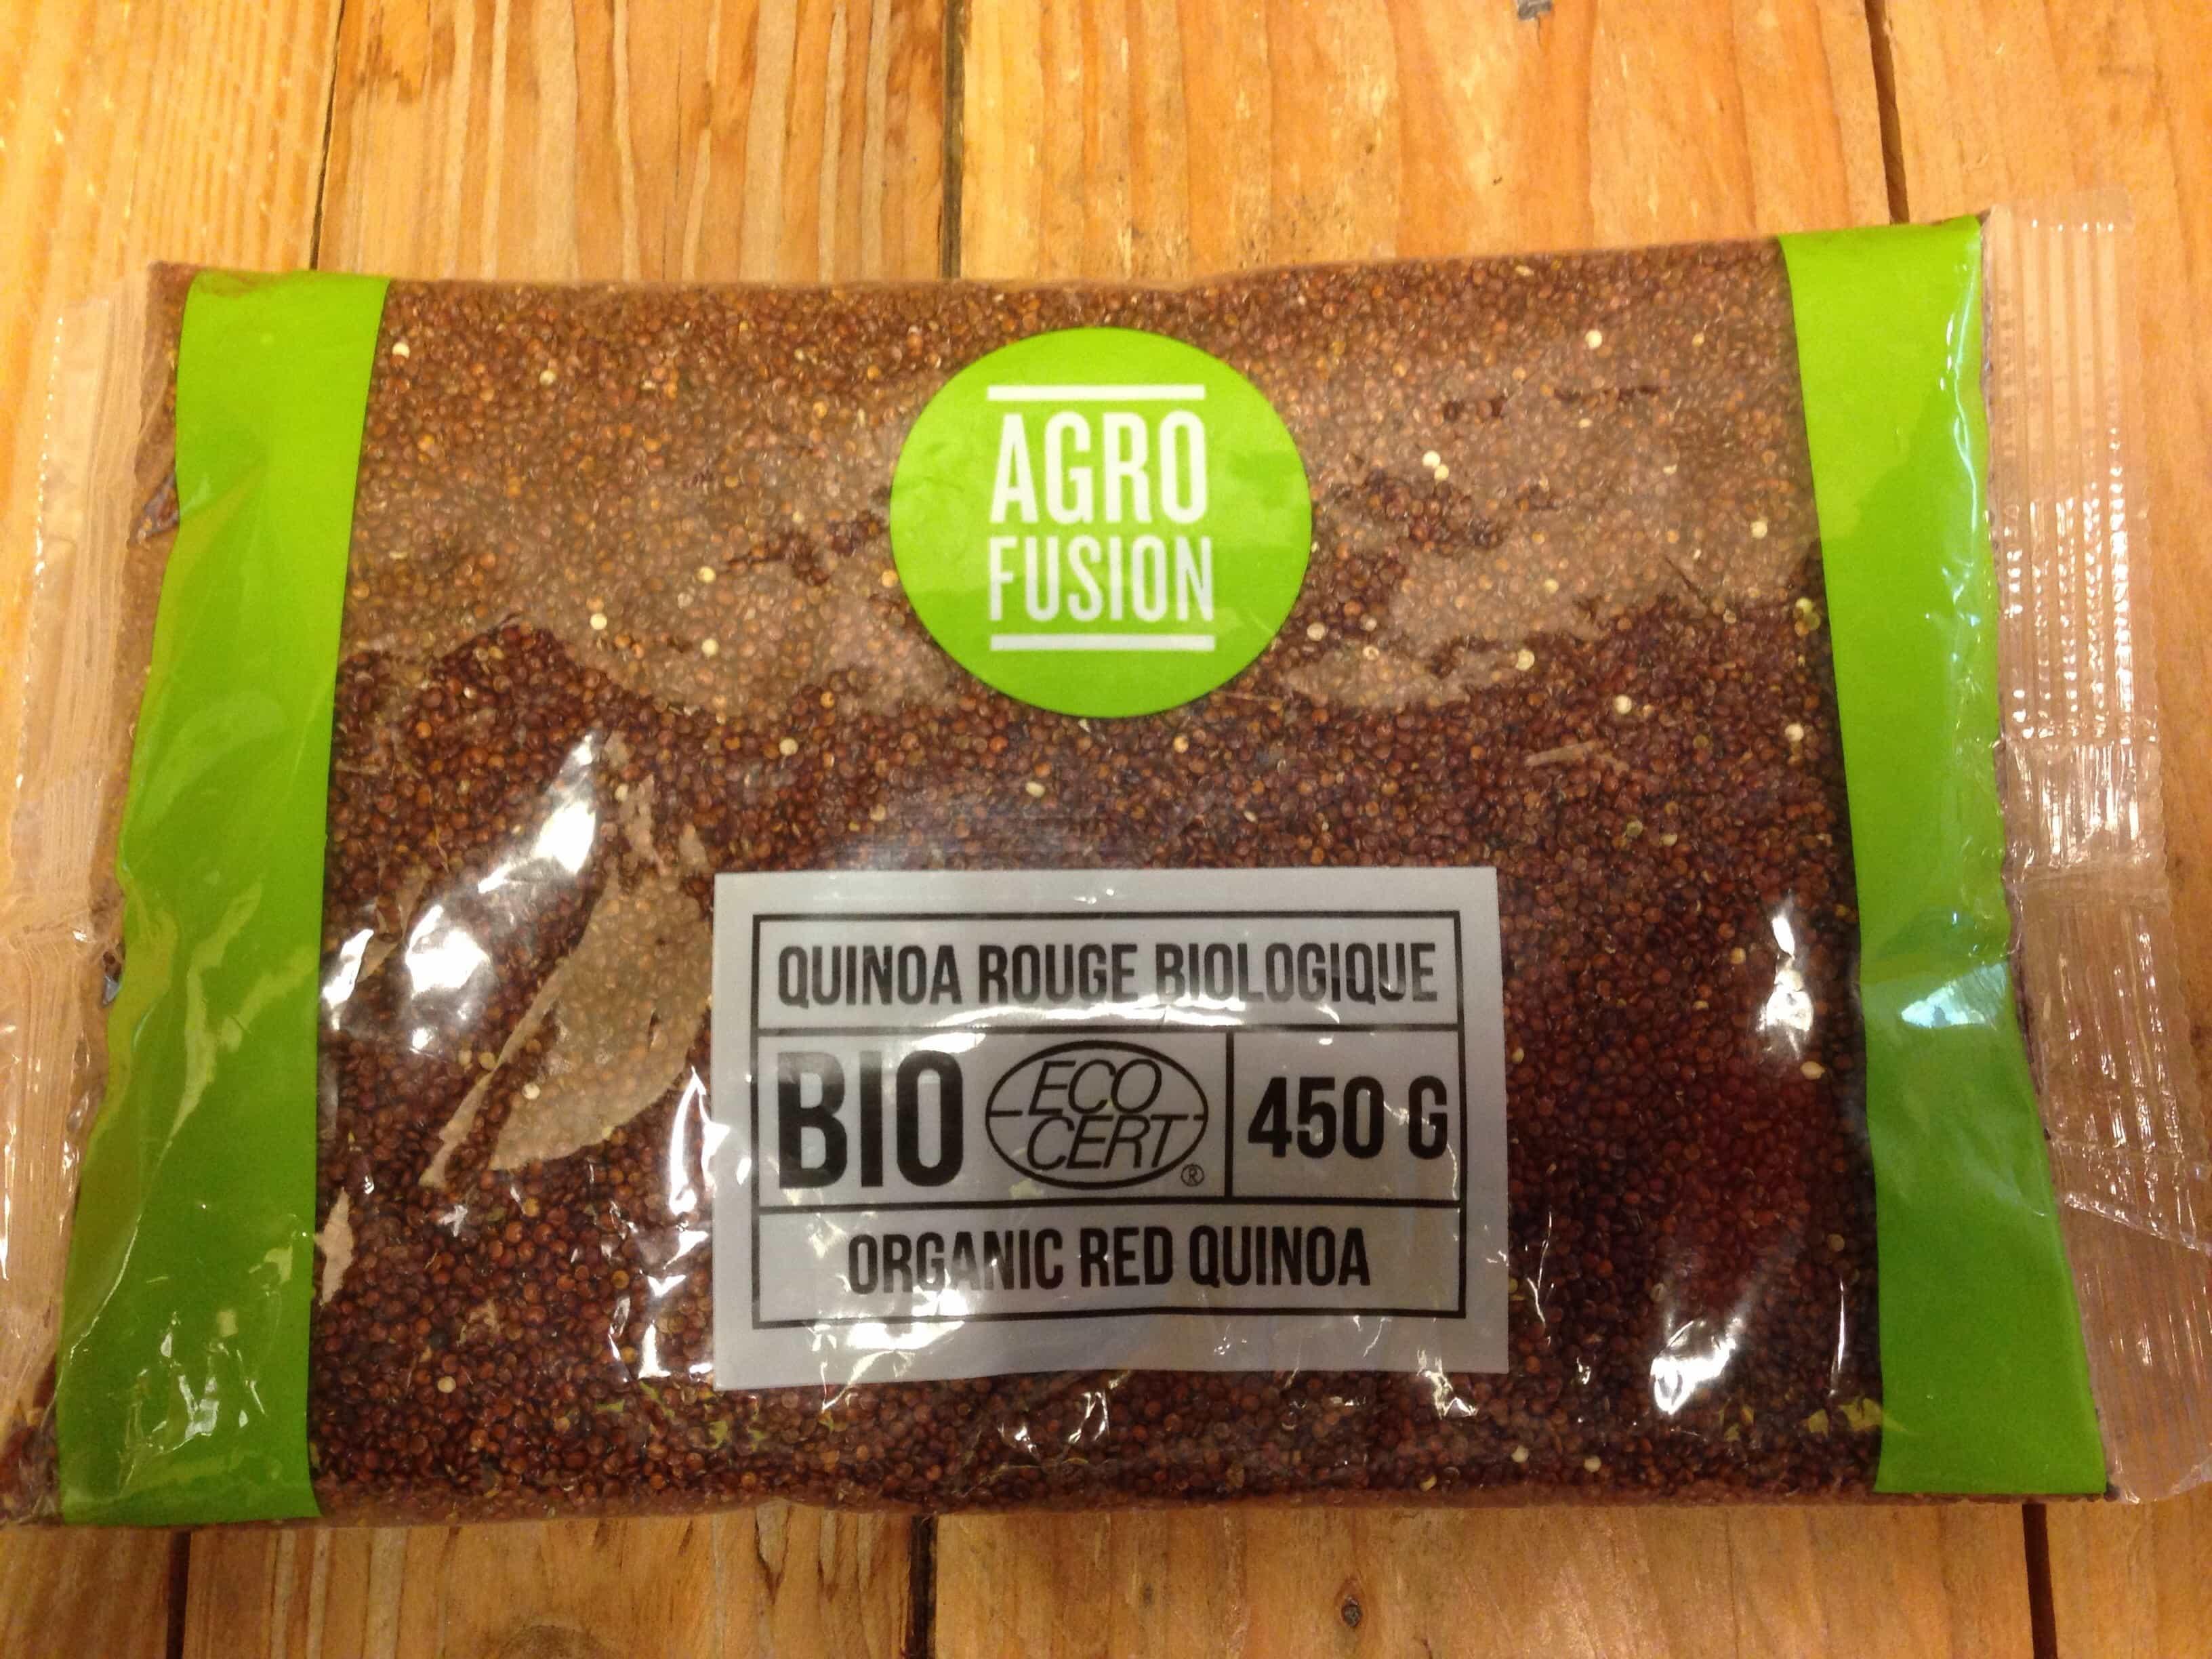 Agro Fusion – Quinoa Red (450g)